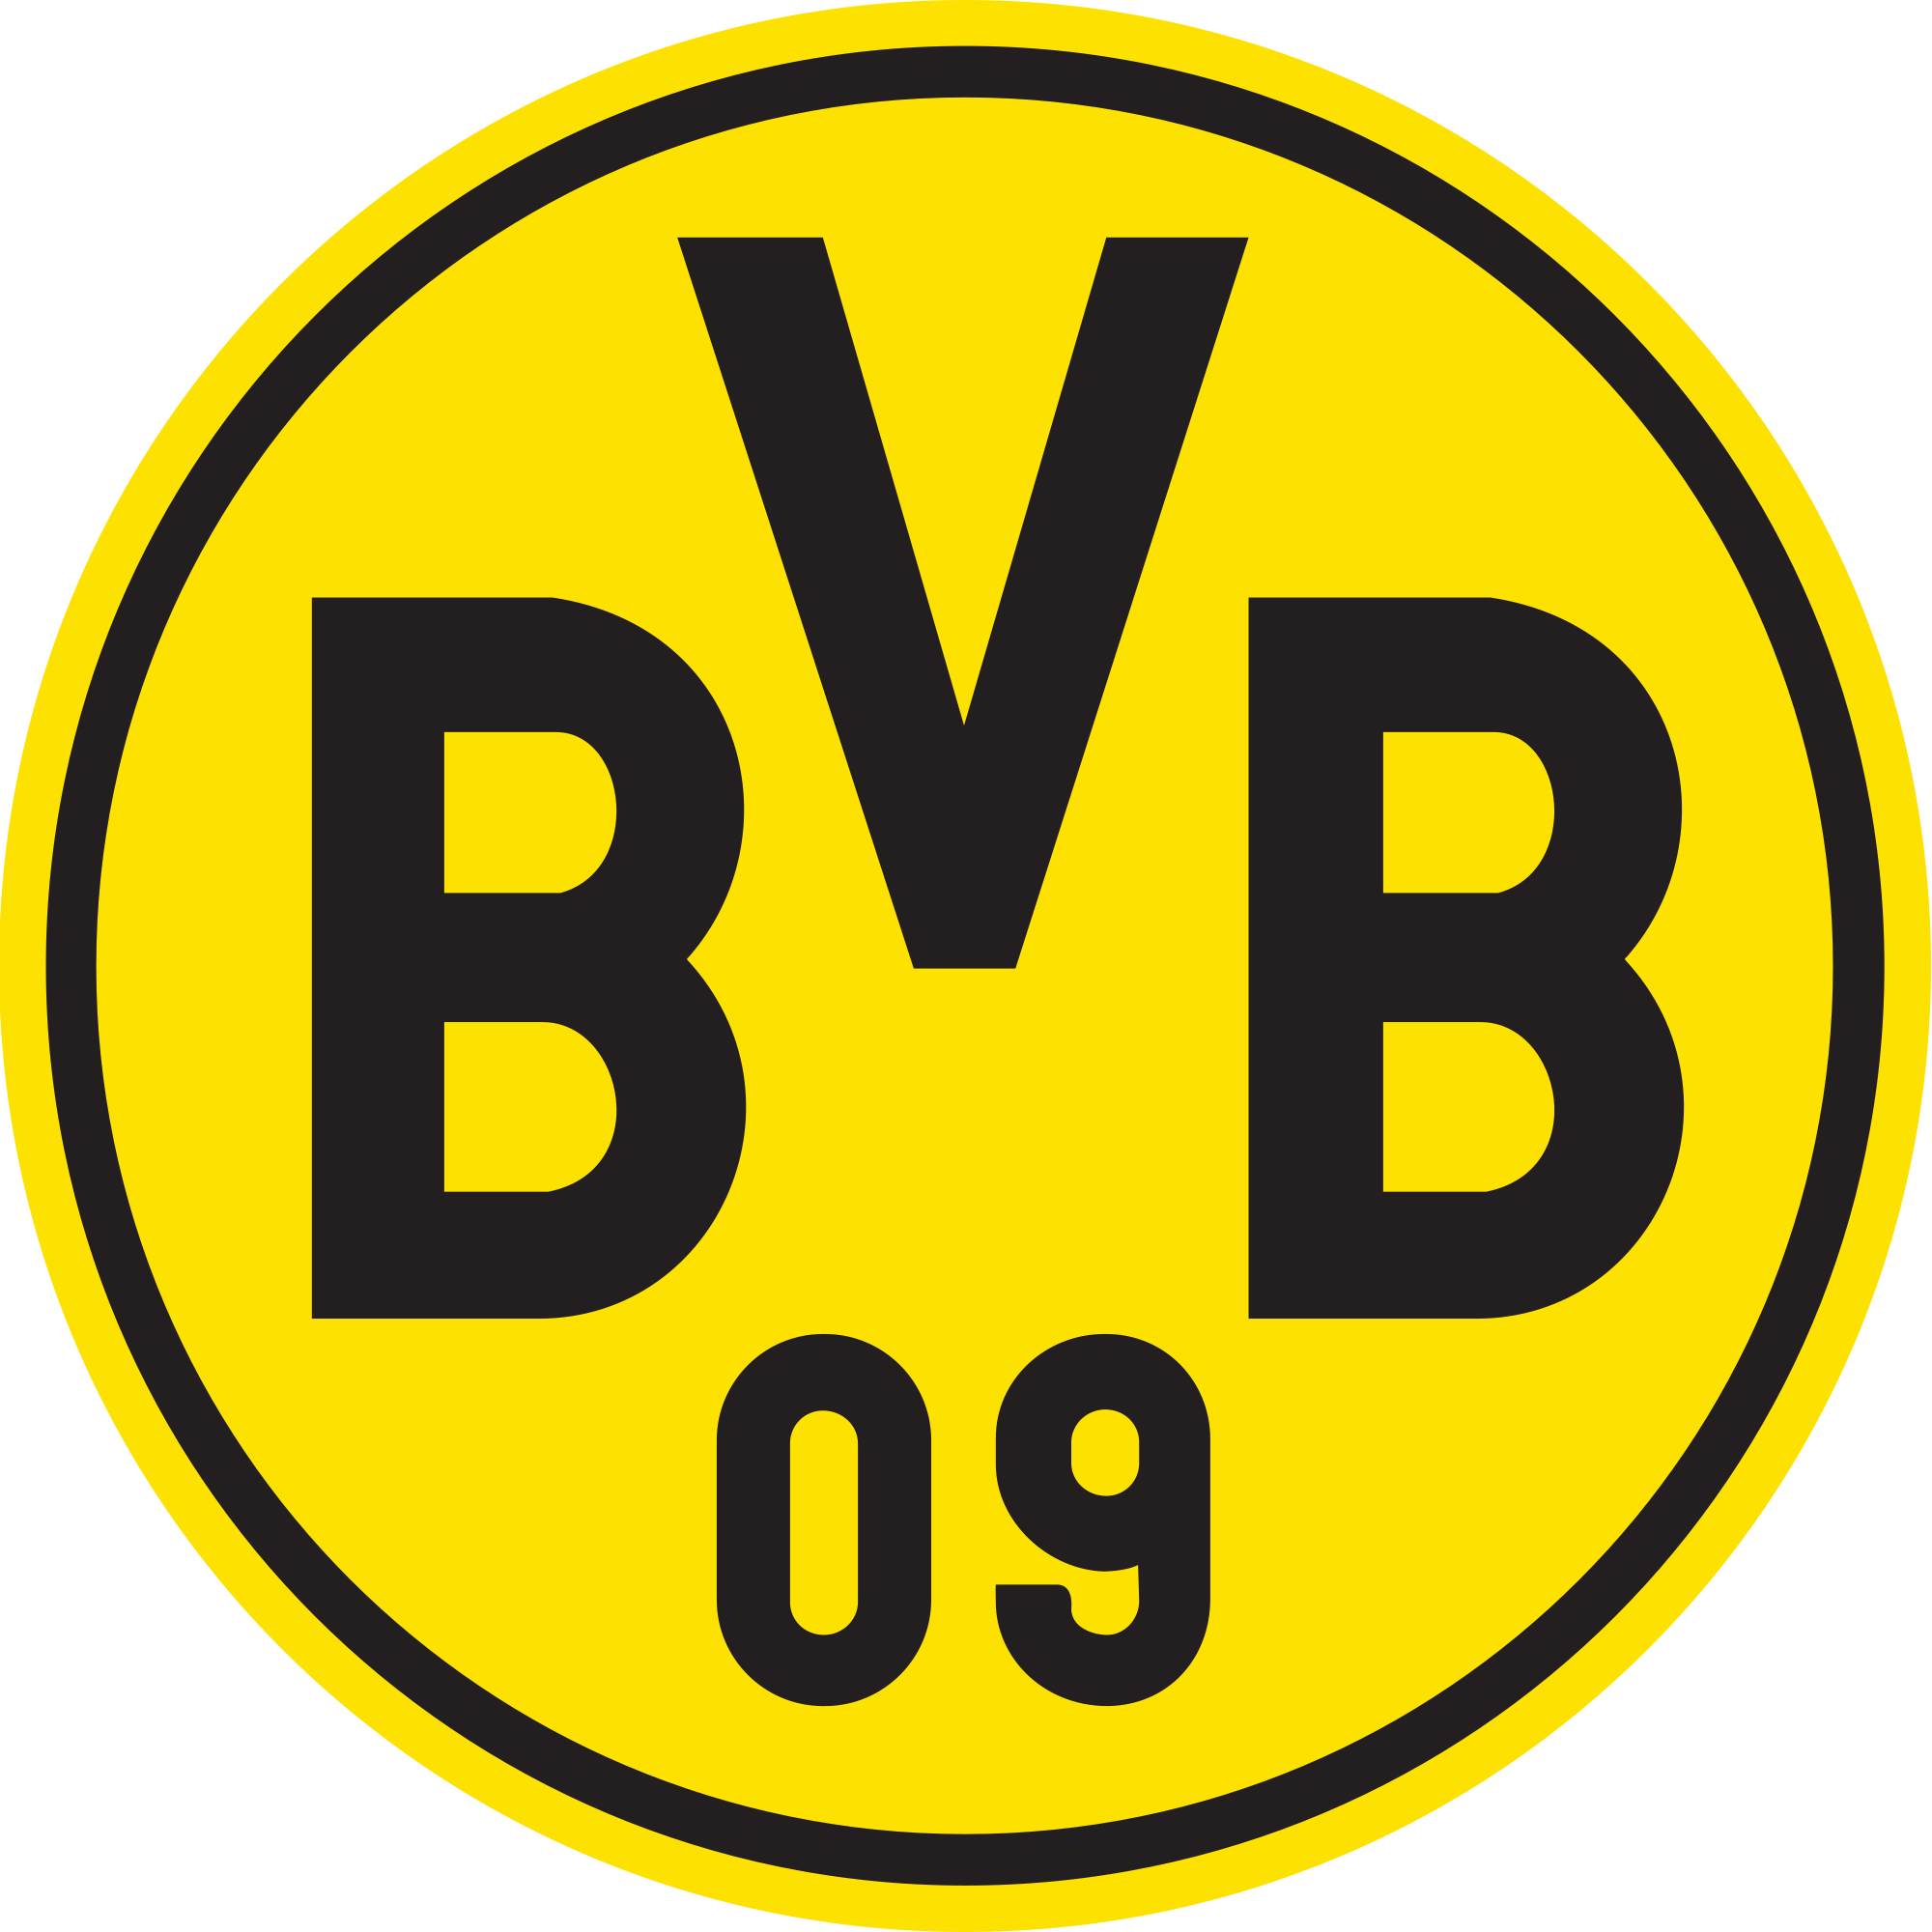 borussia dortmund logo | Боруссия дортмунд, Дортмунд, Милуоки